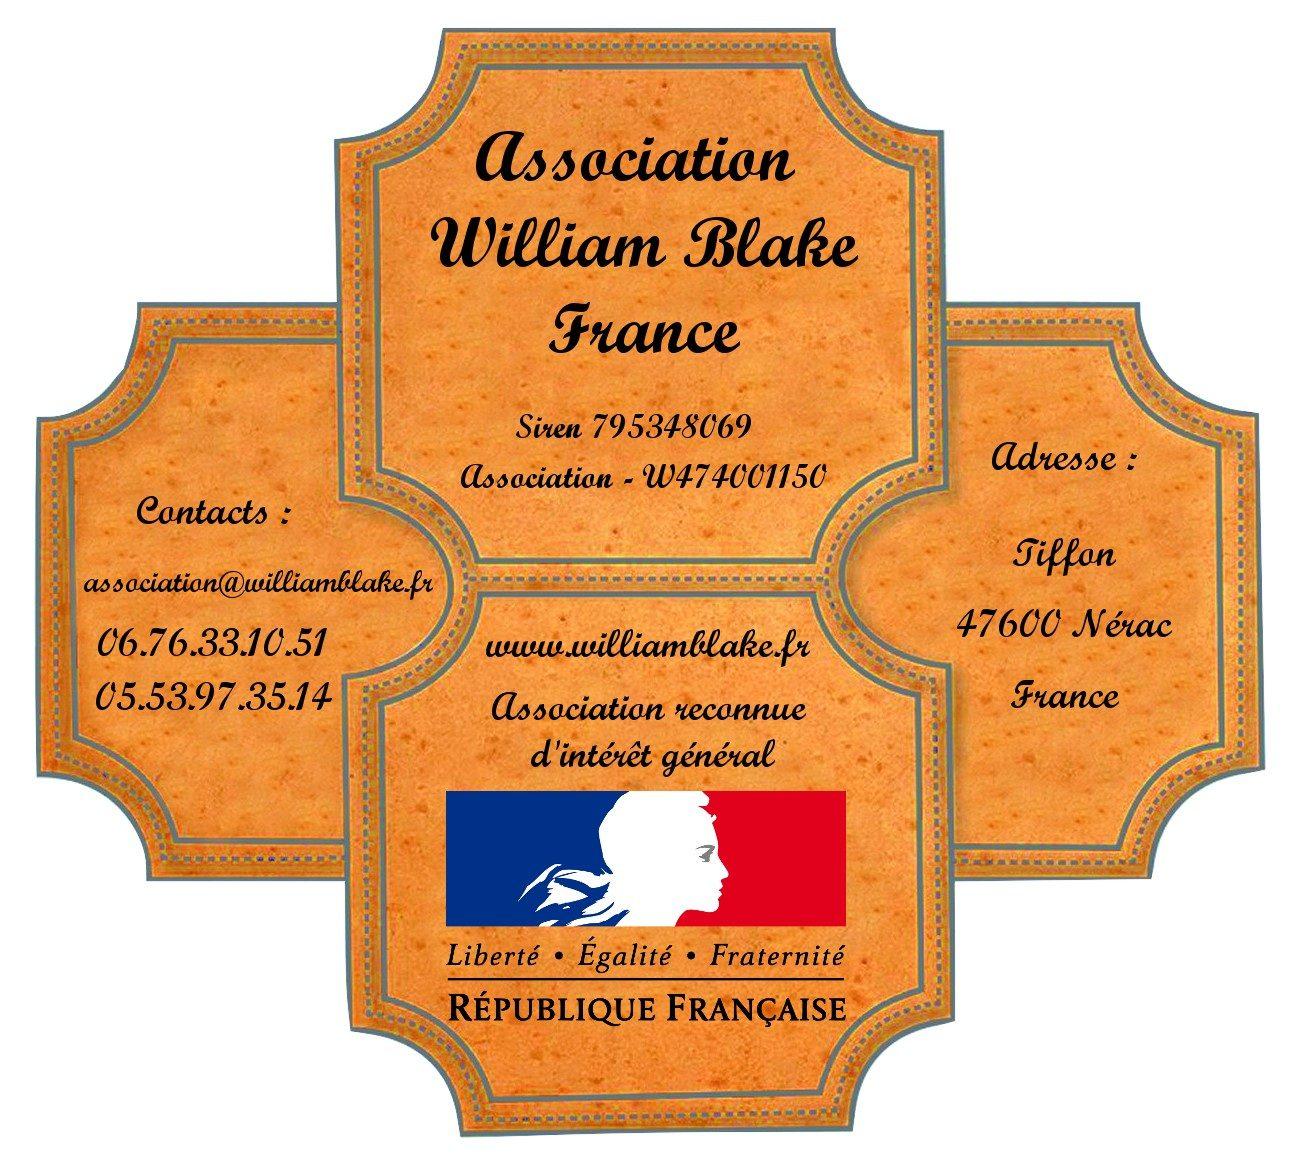 William Blake France